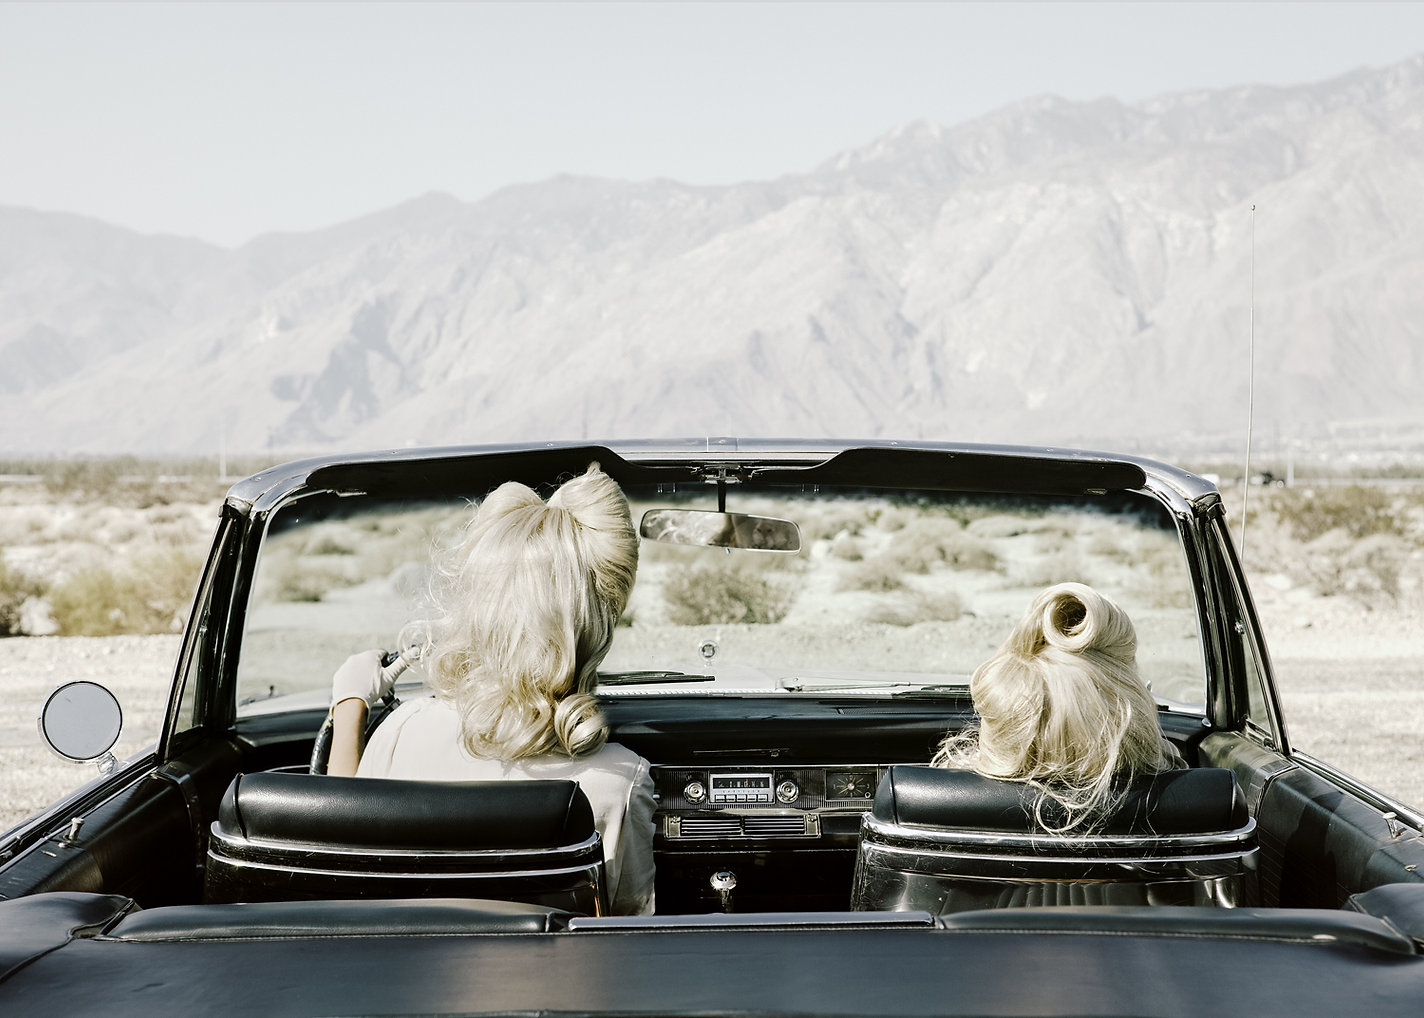 The-Chrysler-©-Anja-Niemi.jpg